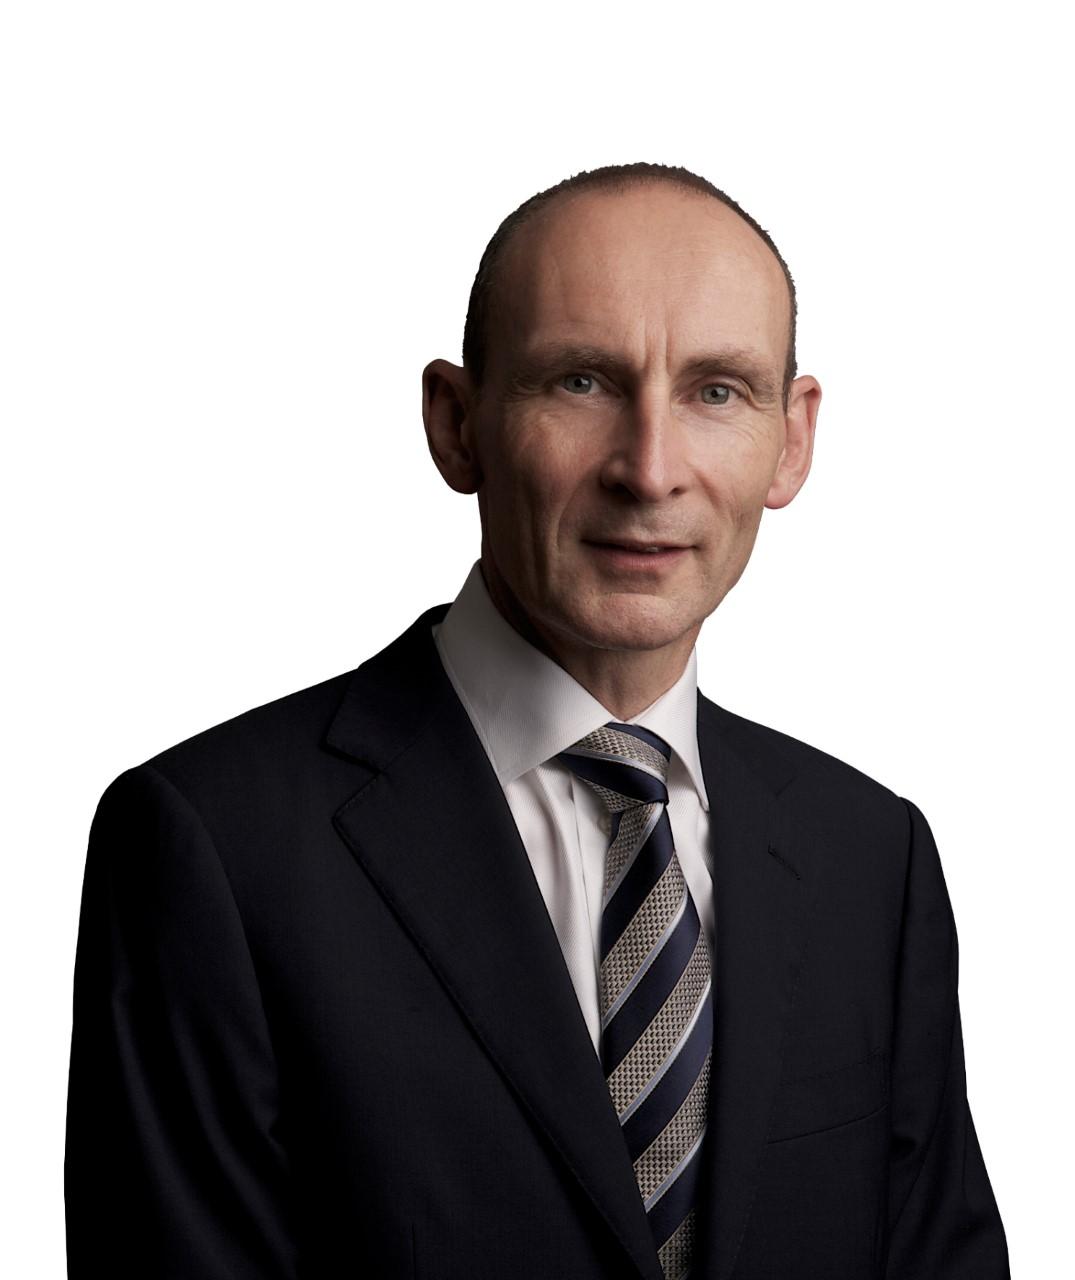 Nigel-Green-CEO-deVere-Group